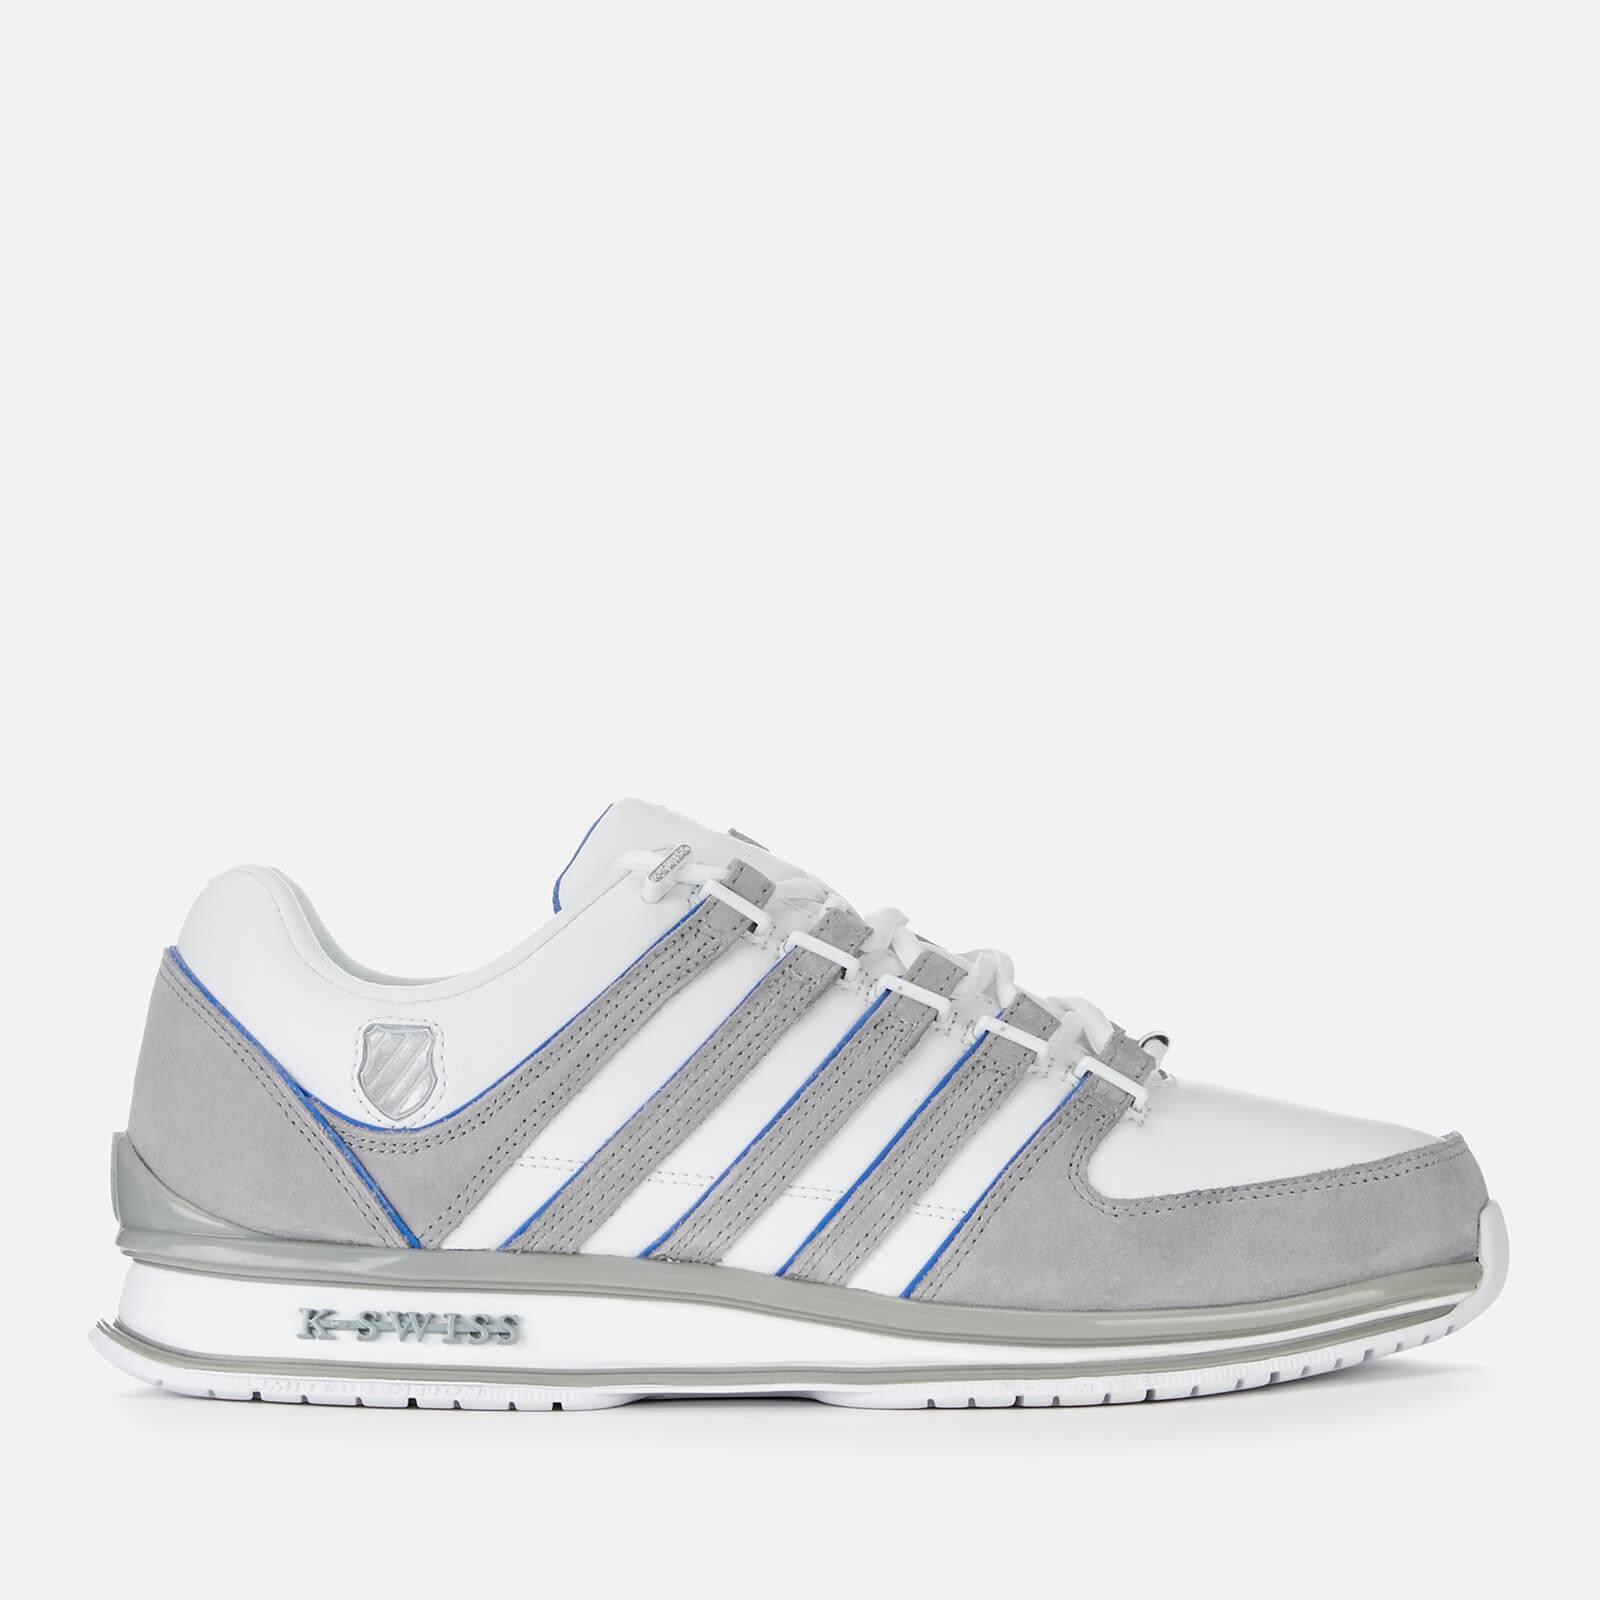 396d54f601d6a K-Swiss Men's Rinzler SP Trainers - White/Strong Blue Mens Footwear ...